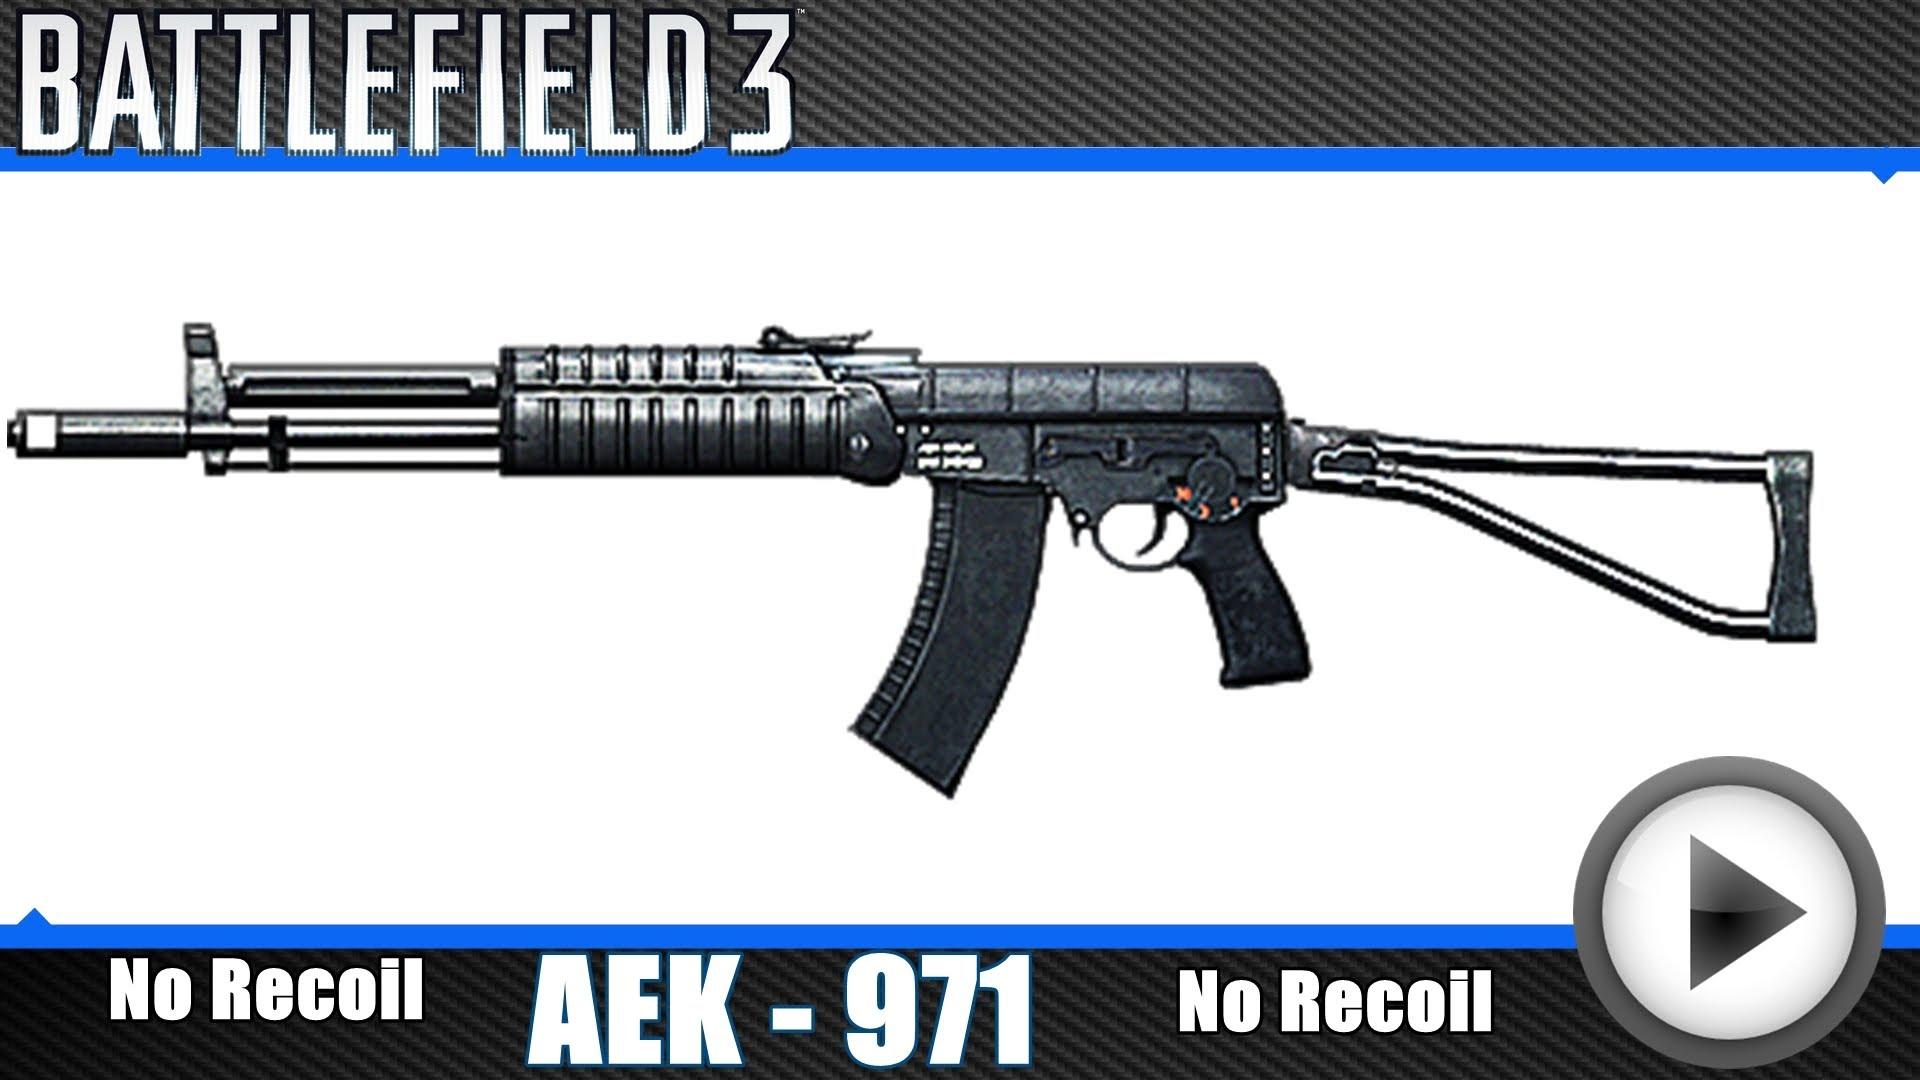 AEK-971 Backgrounds, Compatible - PC, Mobile, Gadgets| 1920x1080 px